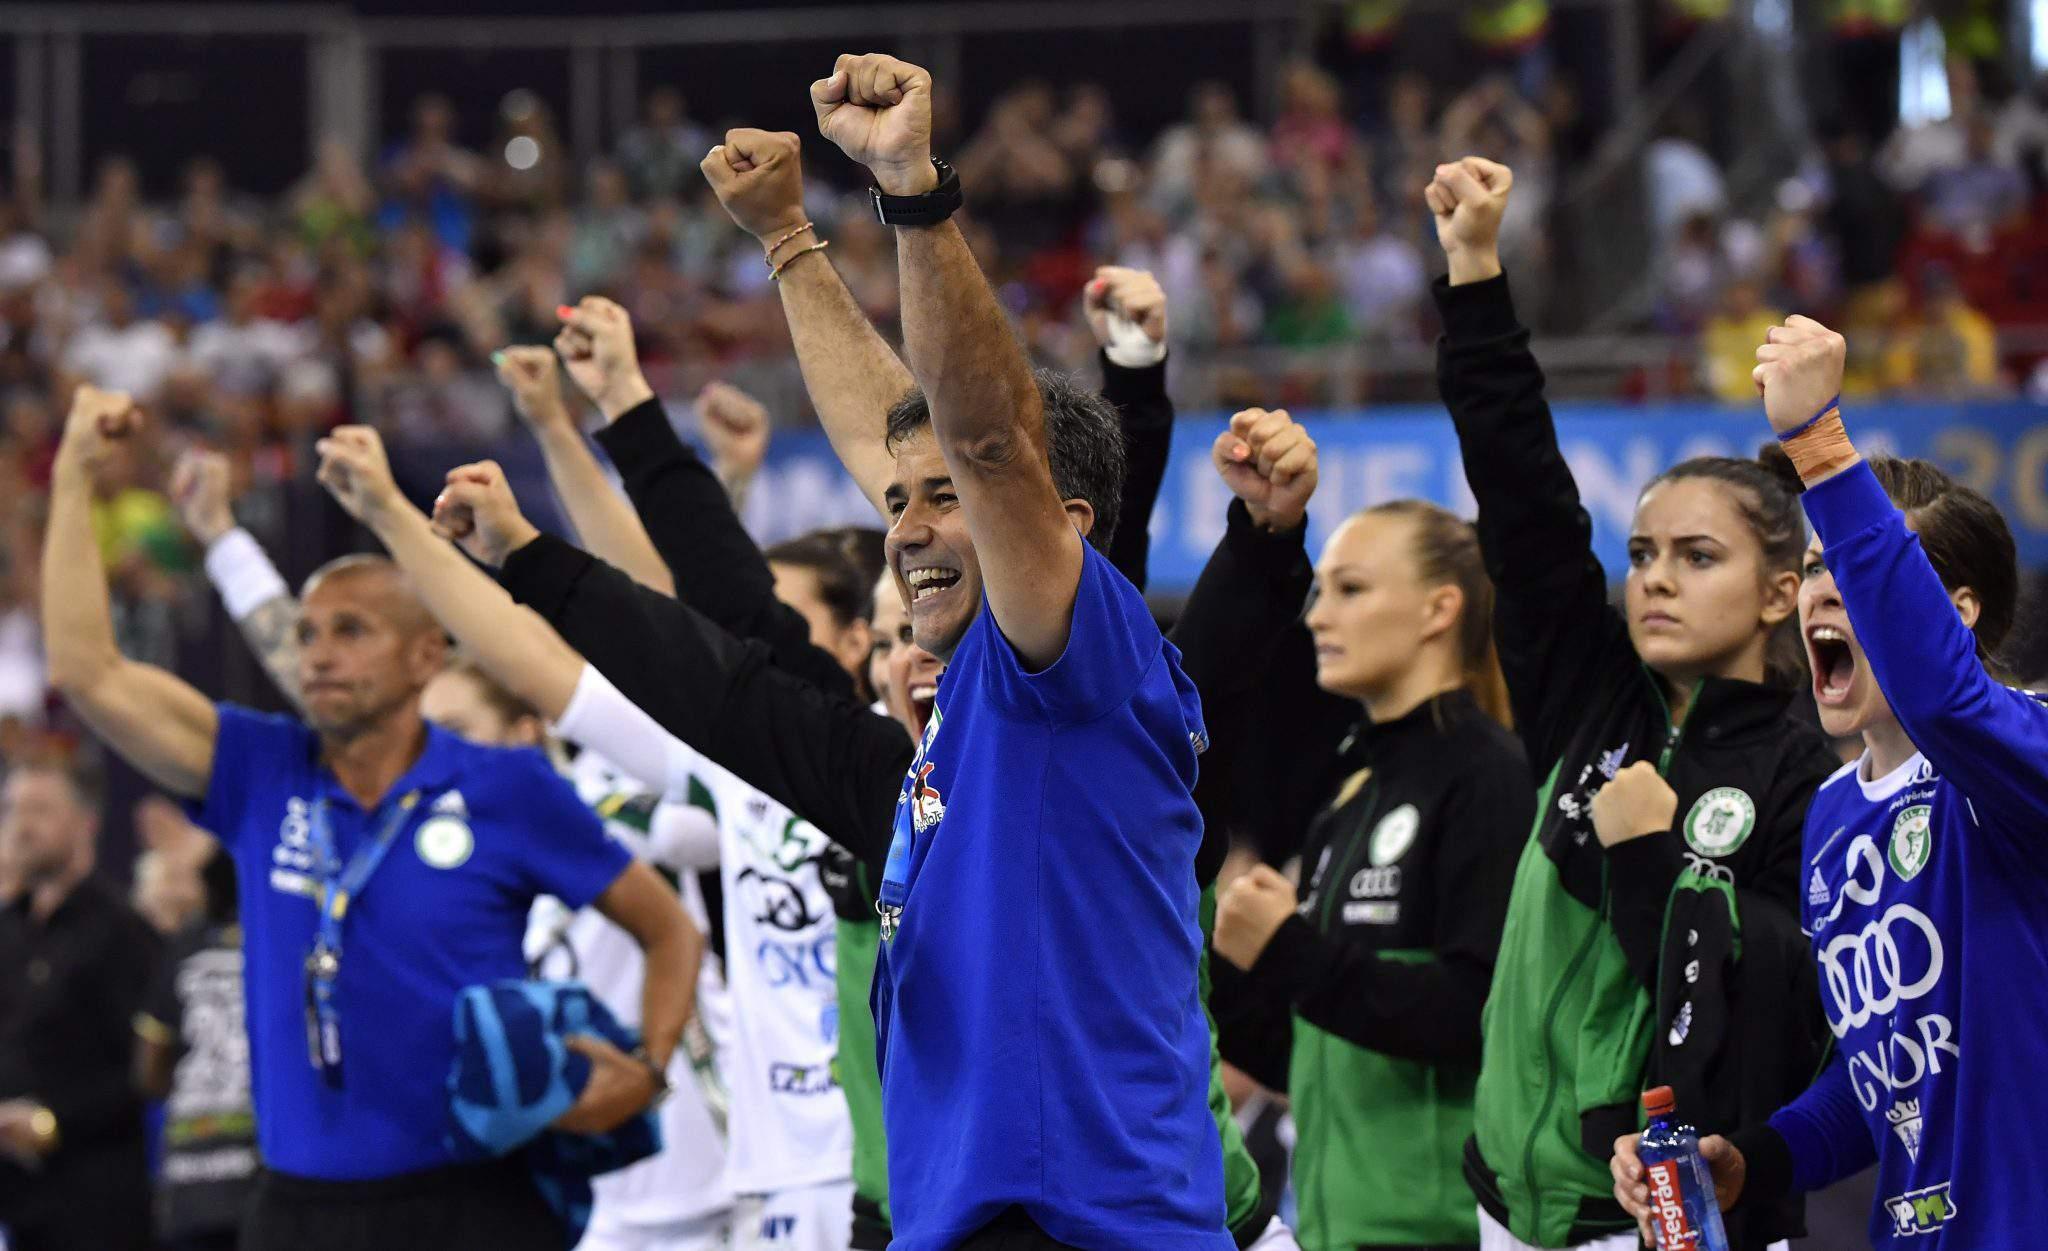 Győri ETO handball team hungary Final Four